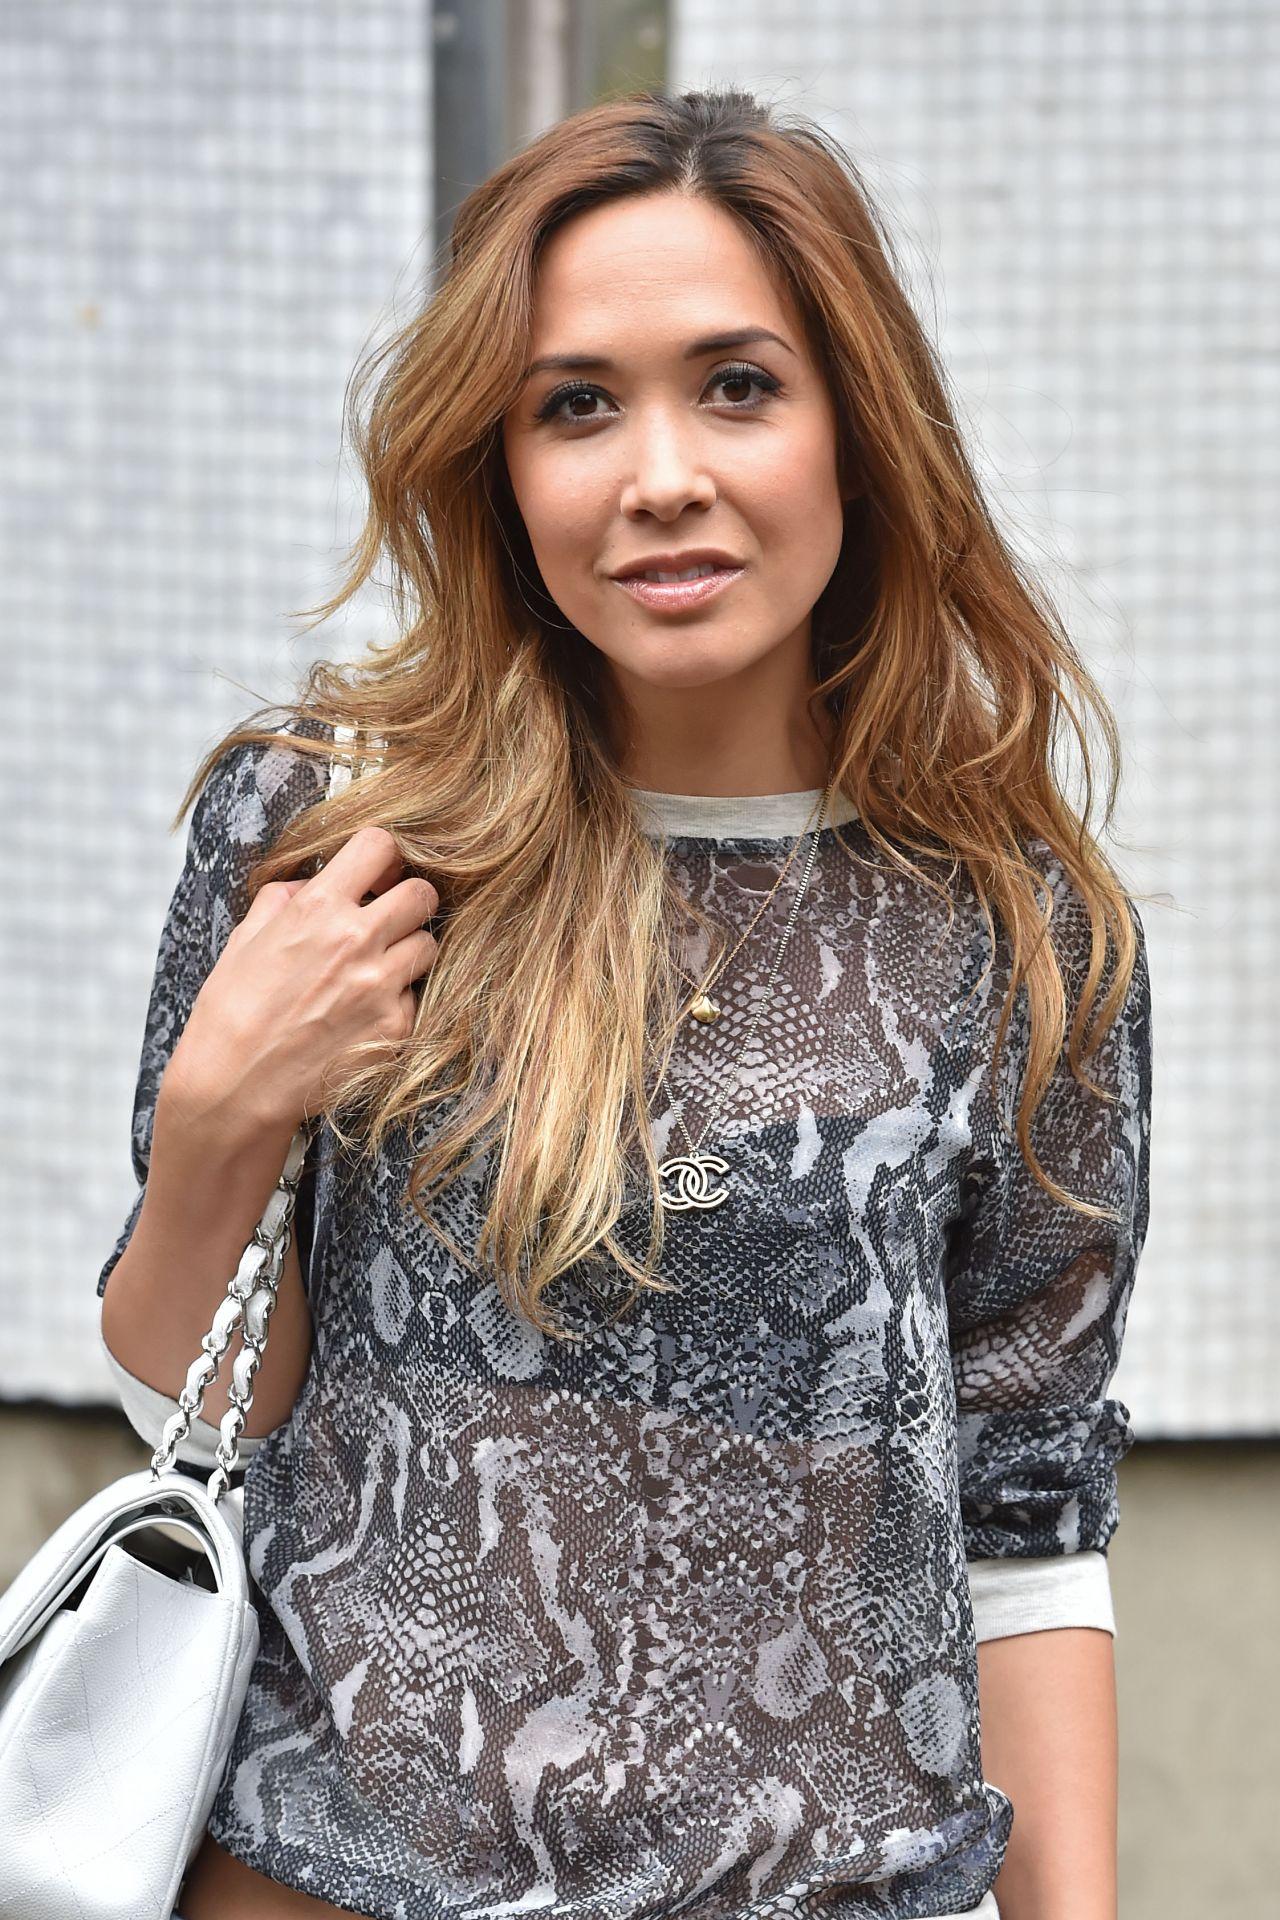 Myleene Klass - Leaving the ITV studios in London - July 2014